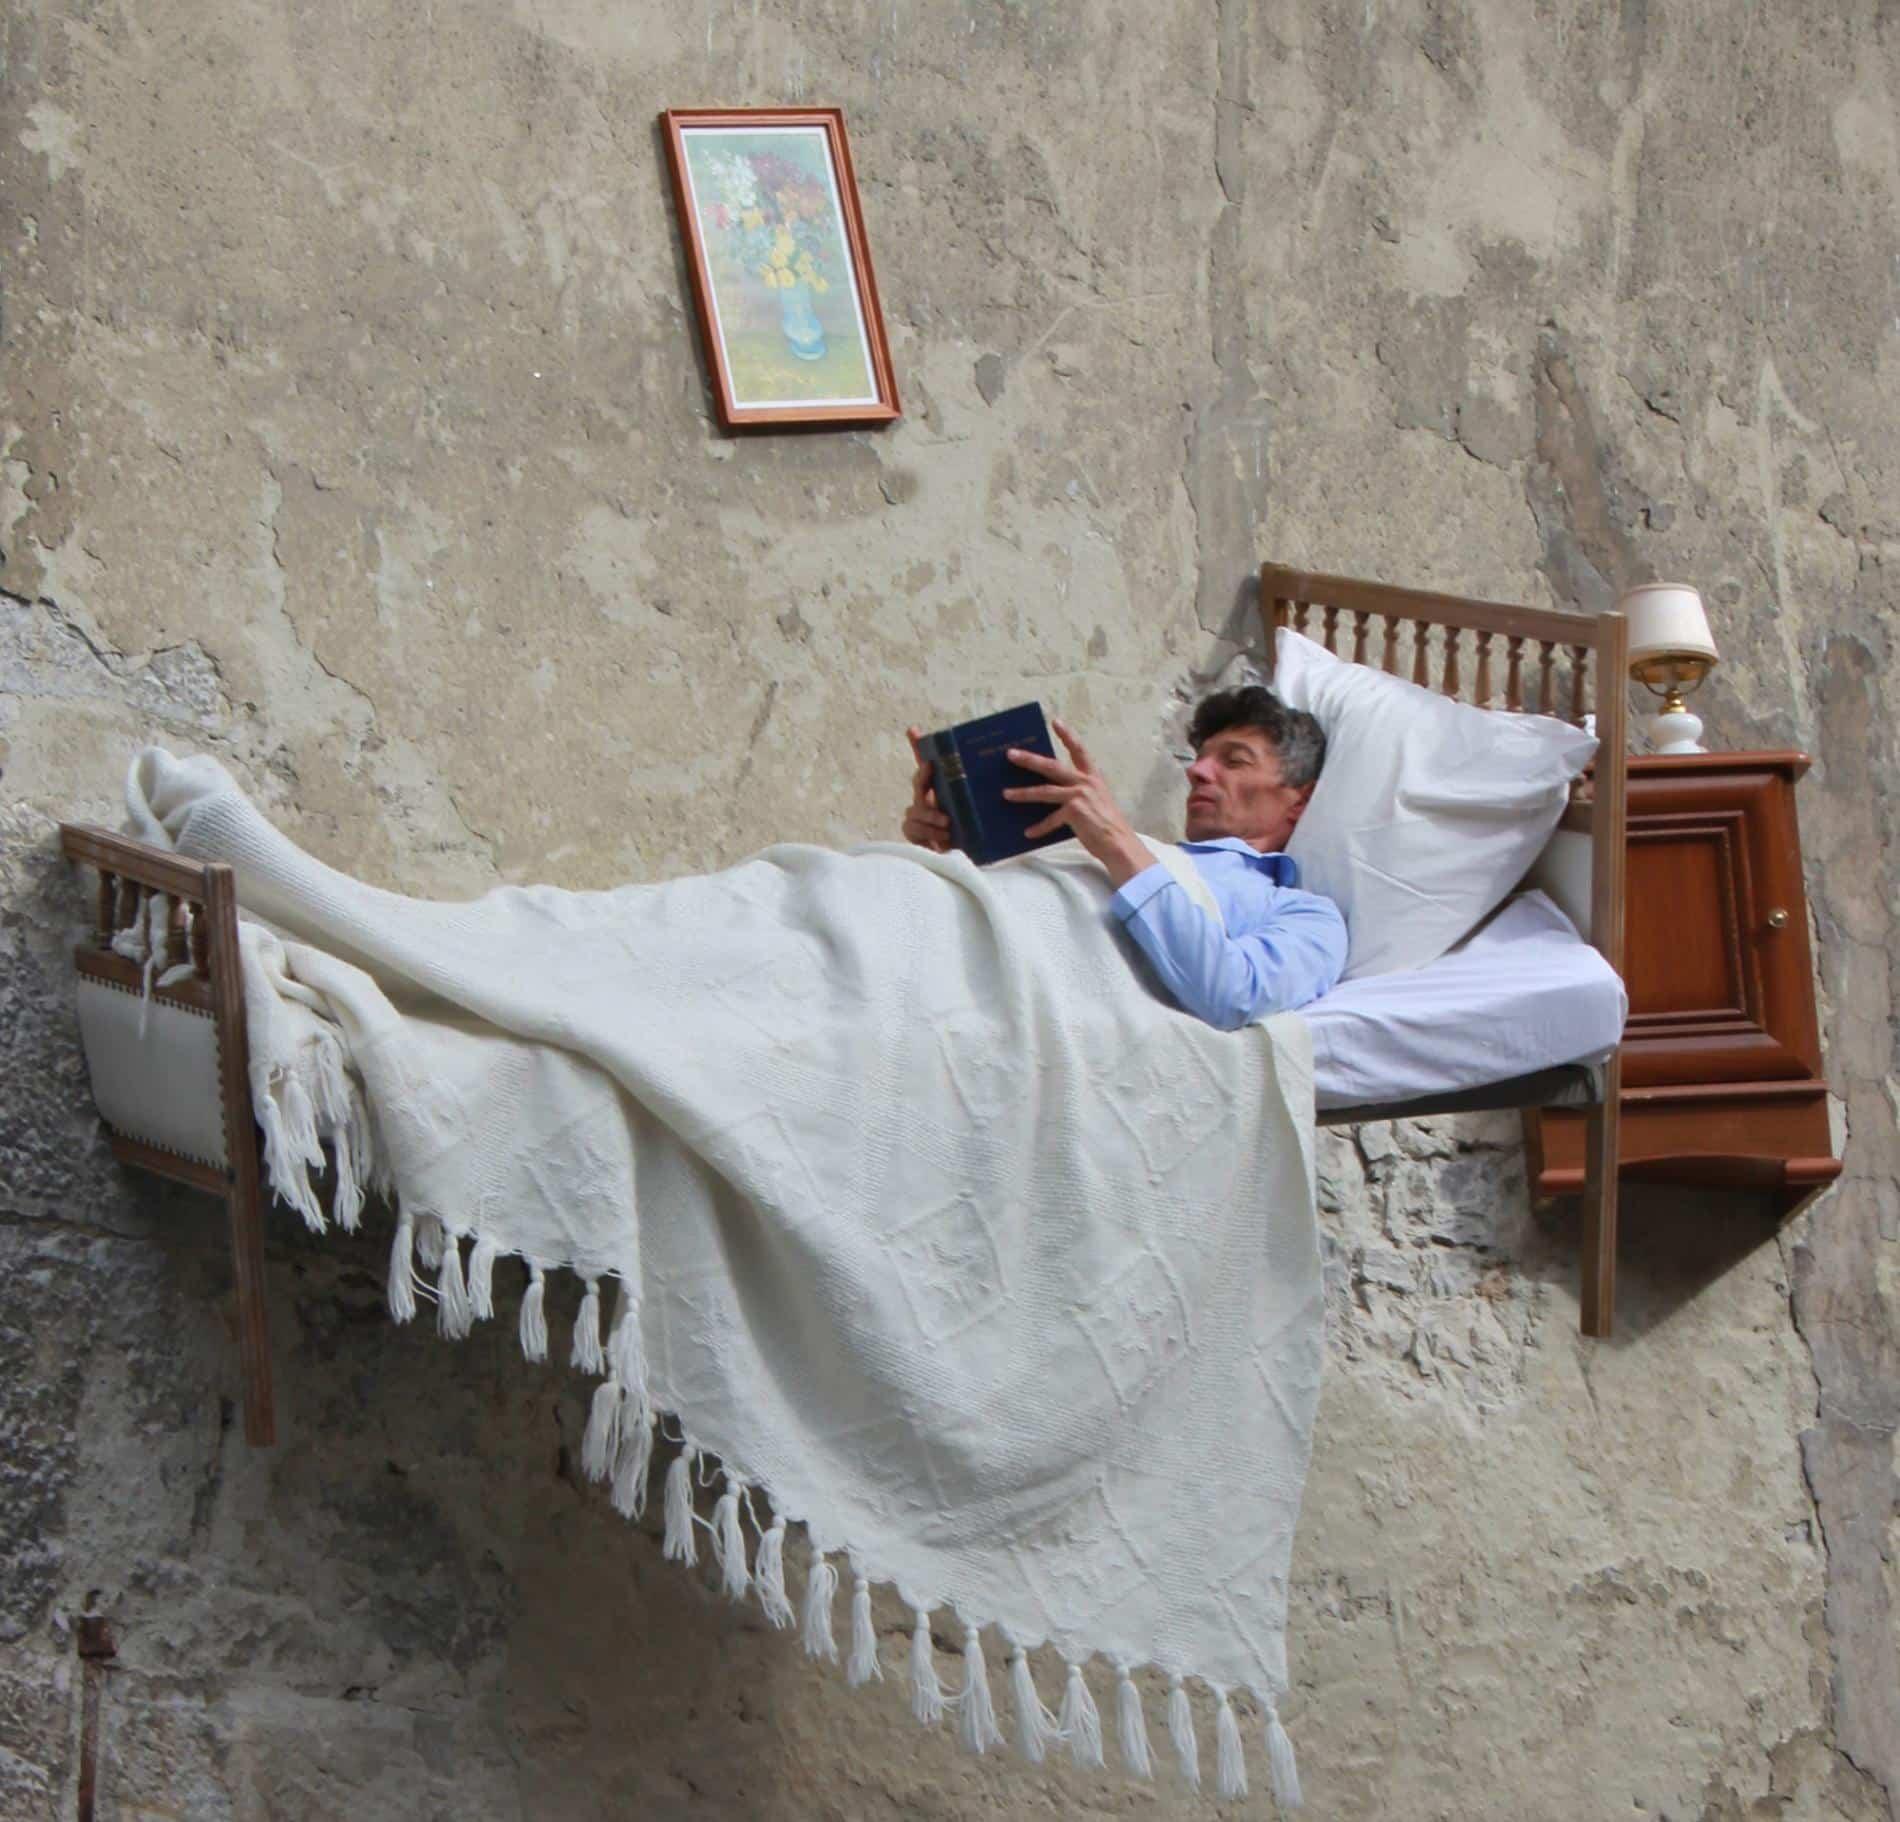 mandon thierry suspendido cama